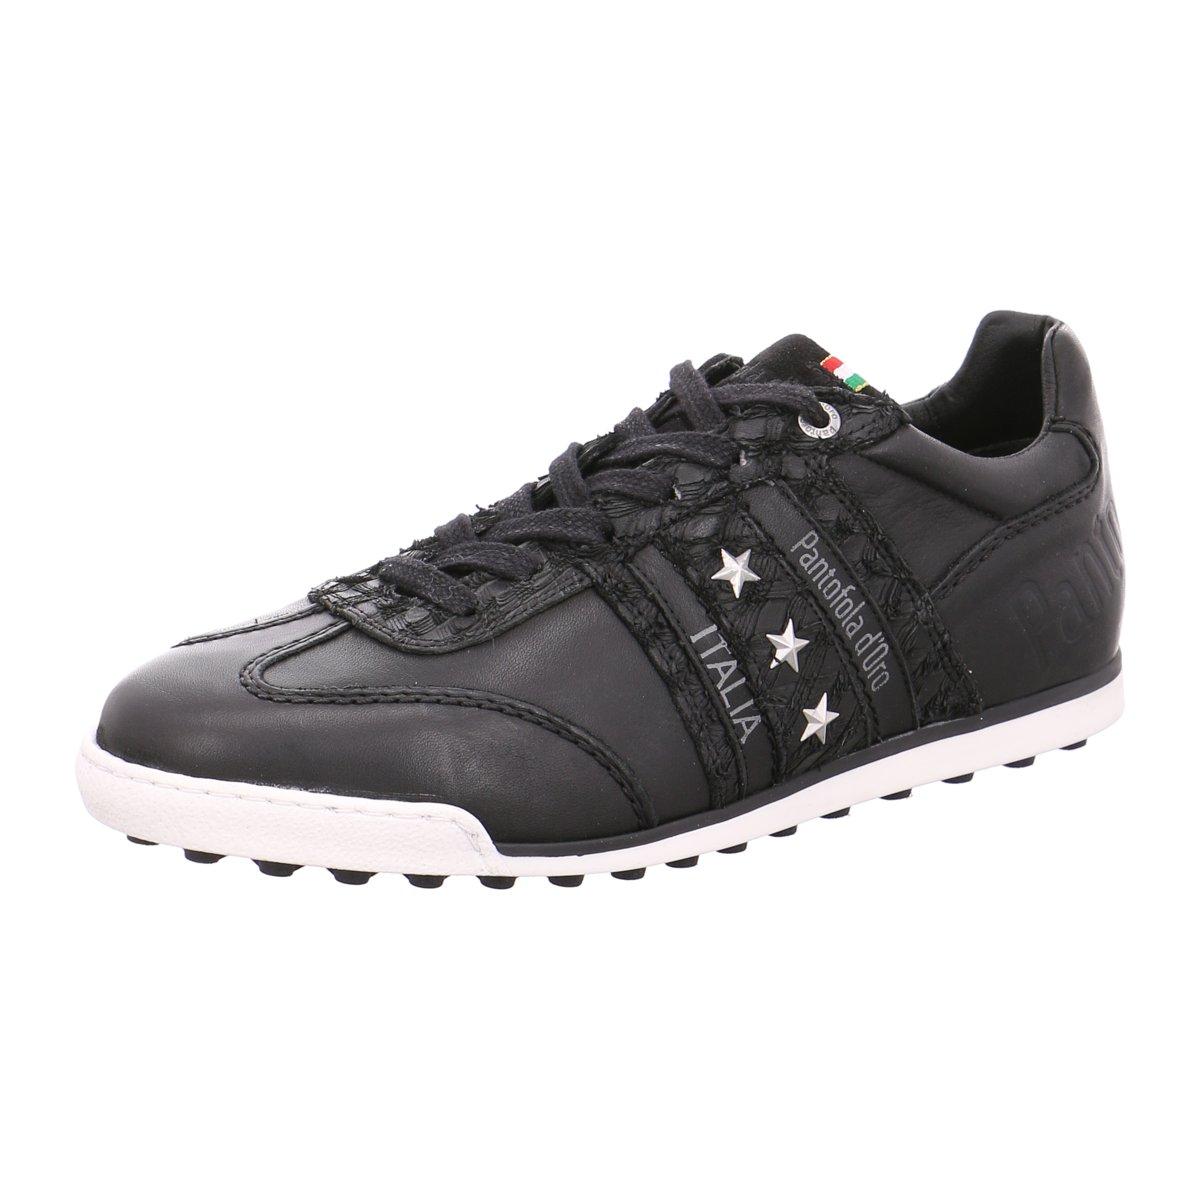 Herren Details Schwarz Oro 25y Imula Zu D` 259248 10171035 Sneaker Soccer Pantofola eWdCBorx